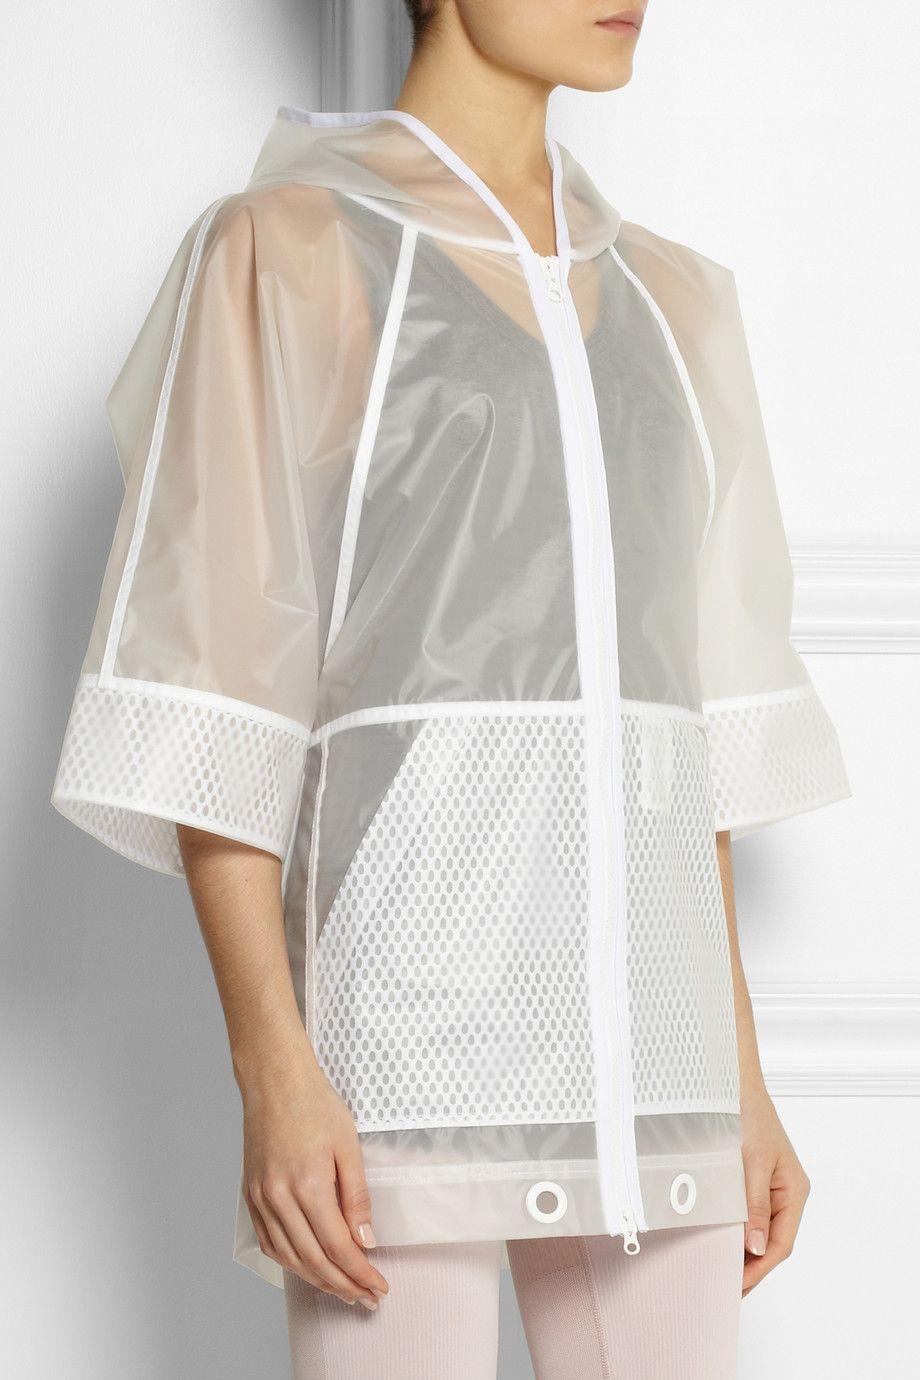 Adidas by Stella McCartney|Hooded vinyl and mesh jacket|NET-A-PORTER.COM